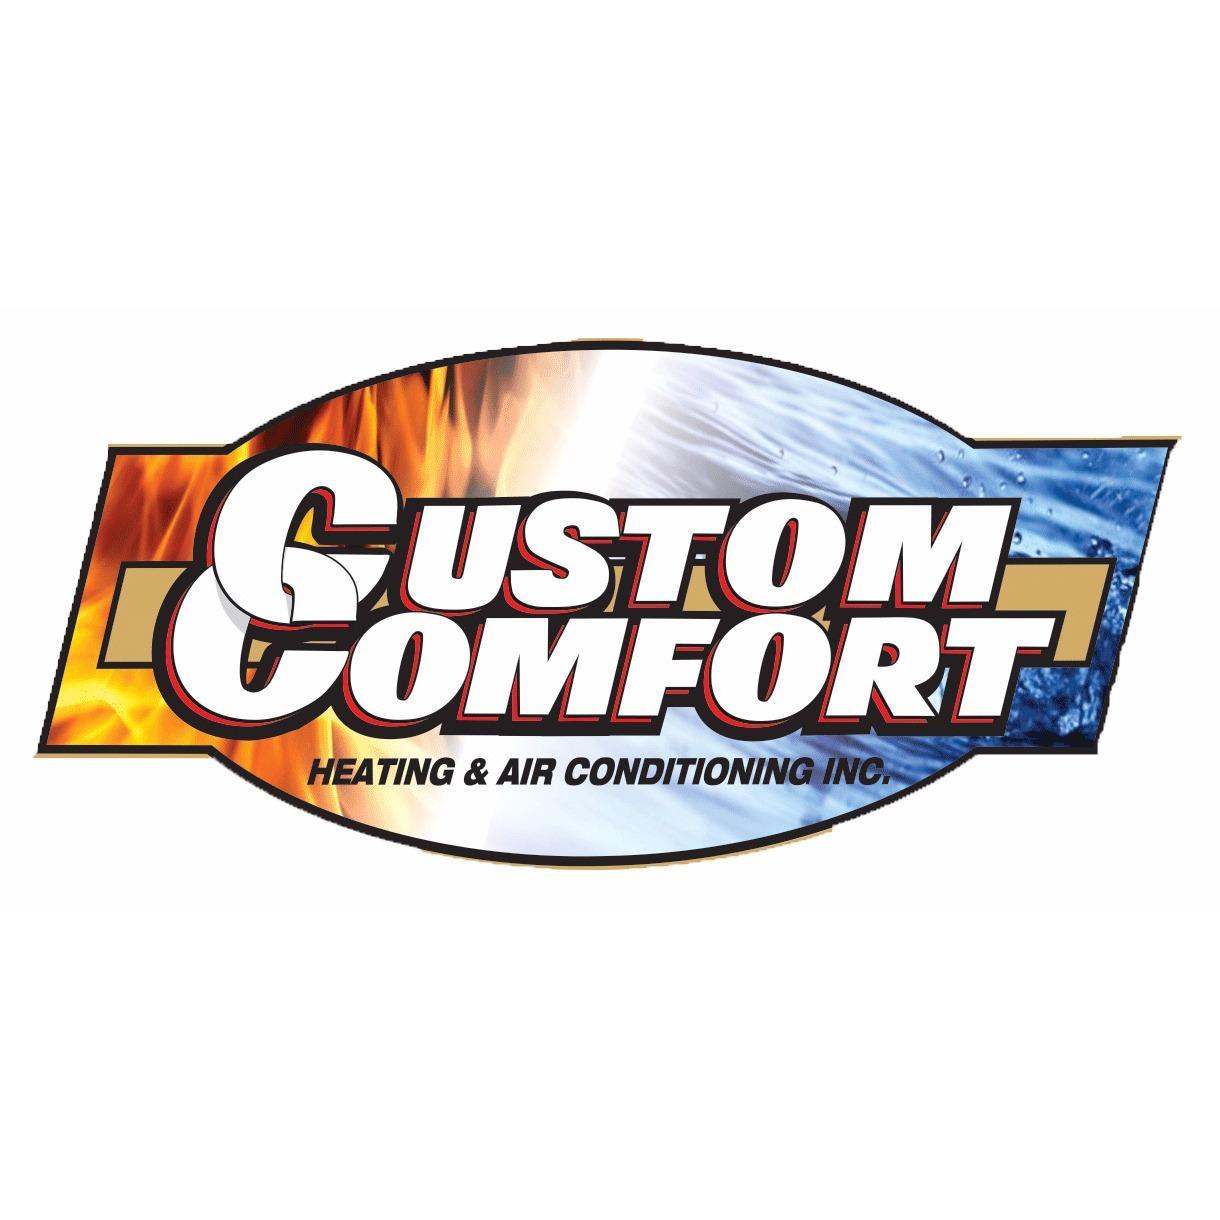 Custom Comfort Heating & A/C Inc - Norton, OH - Heating & Air Conditioning